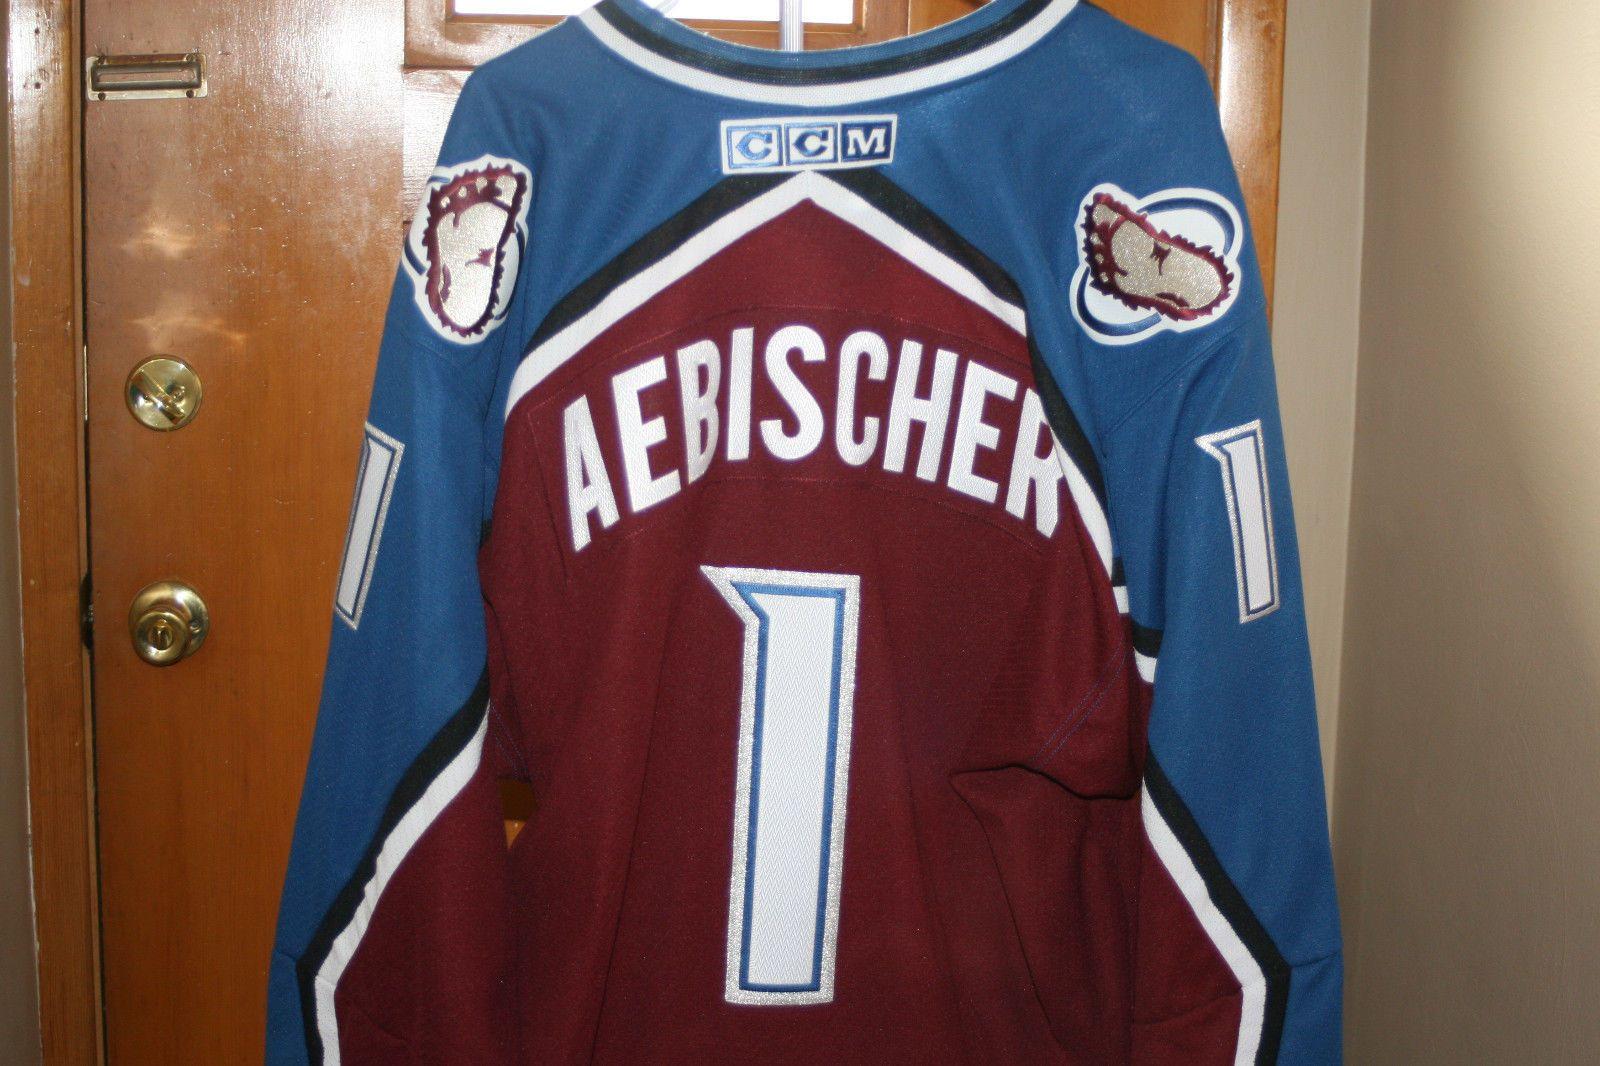 956cbe9a6 DAVID AEBISCHER COLORADO AVALANCHE GOALIE JERSEY CCM NWT VINTAGE RARE NHL  (eBay Link)